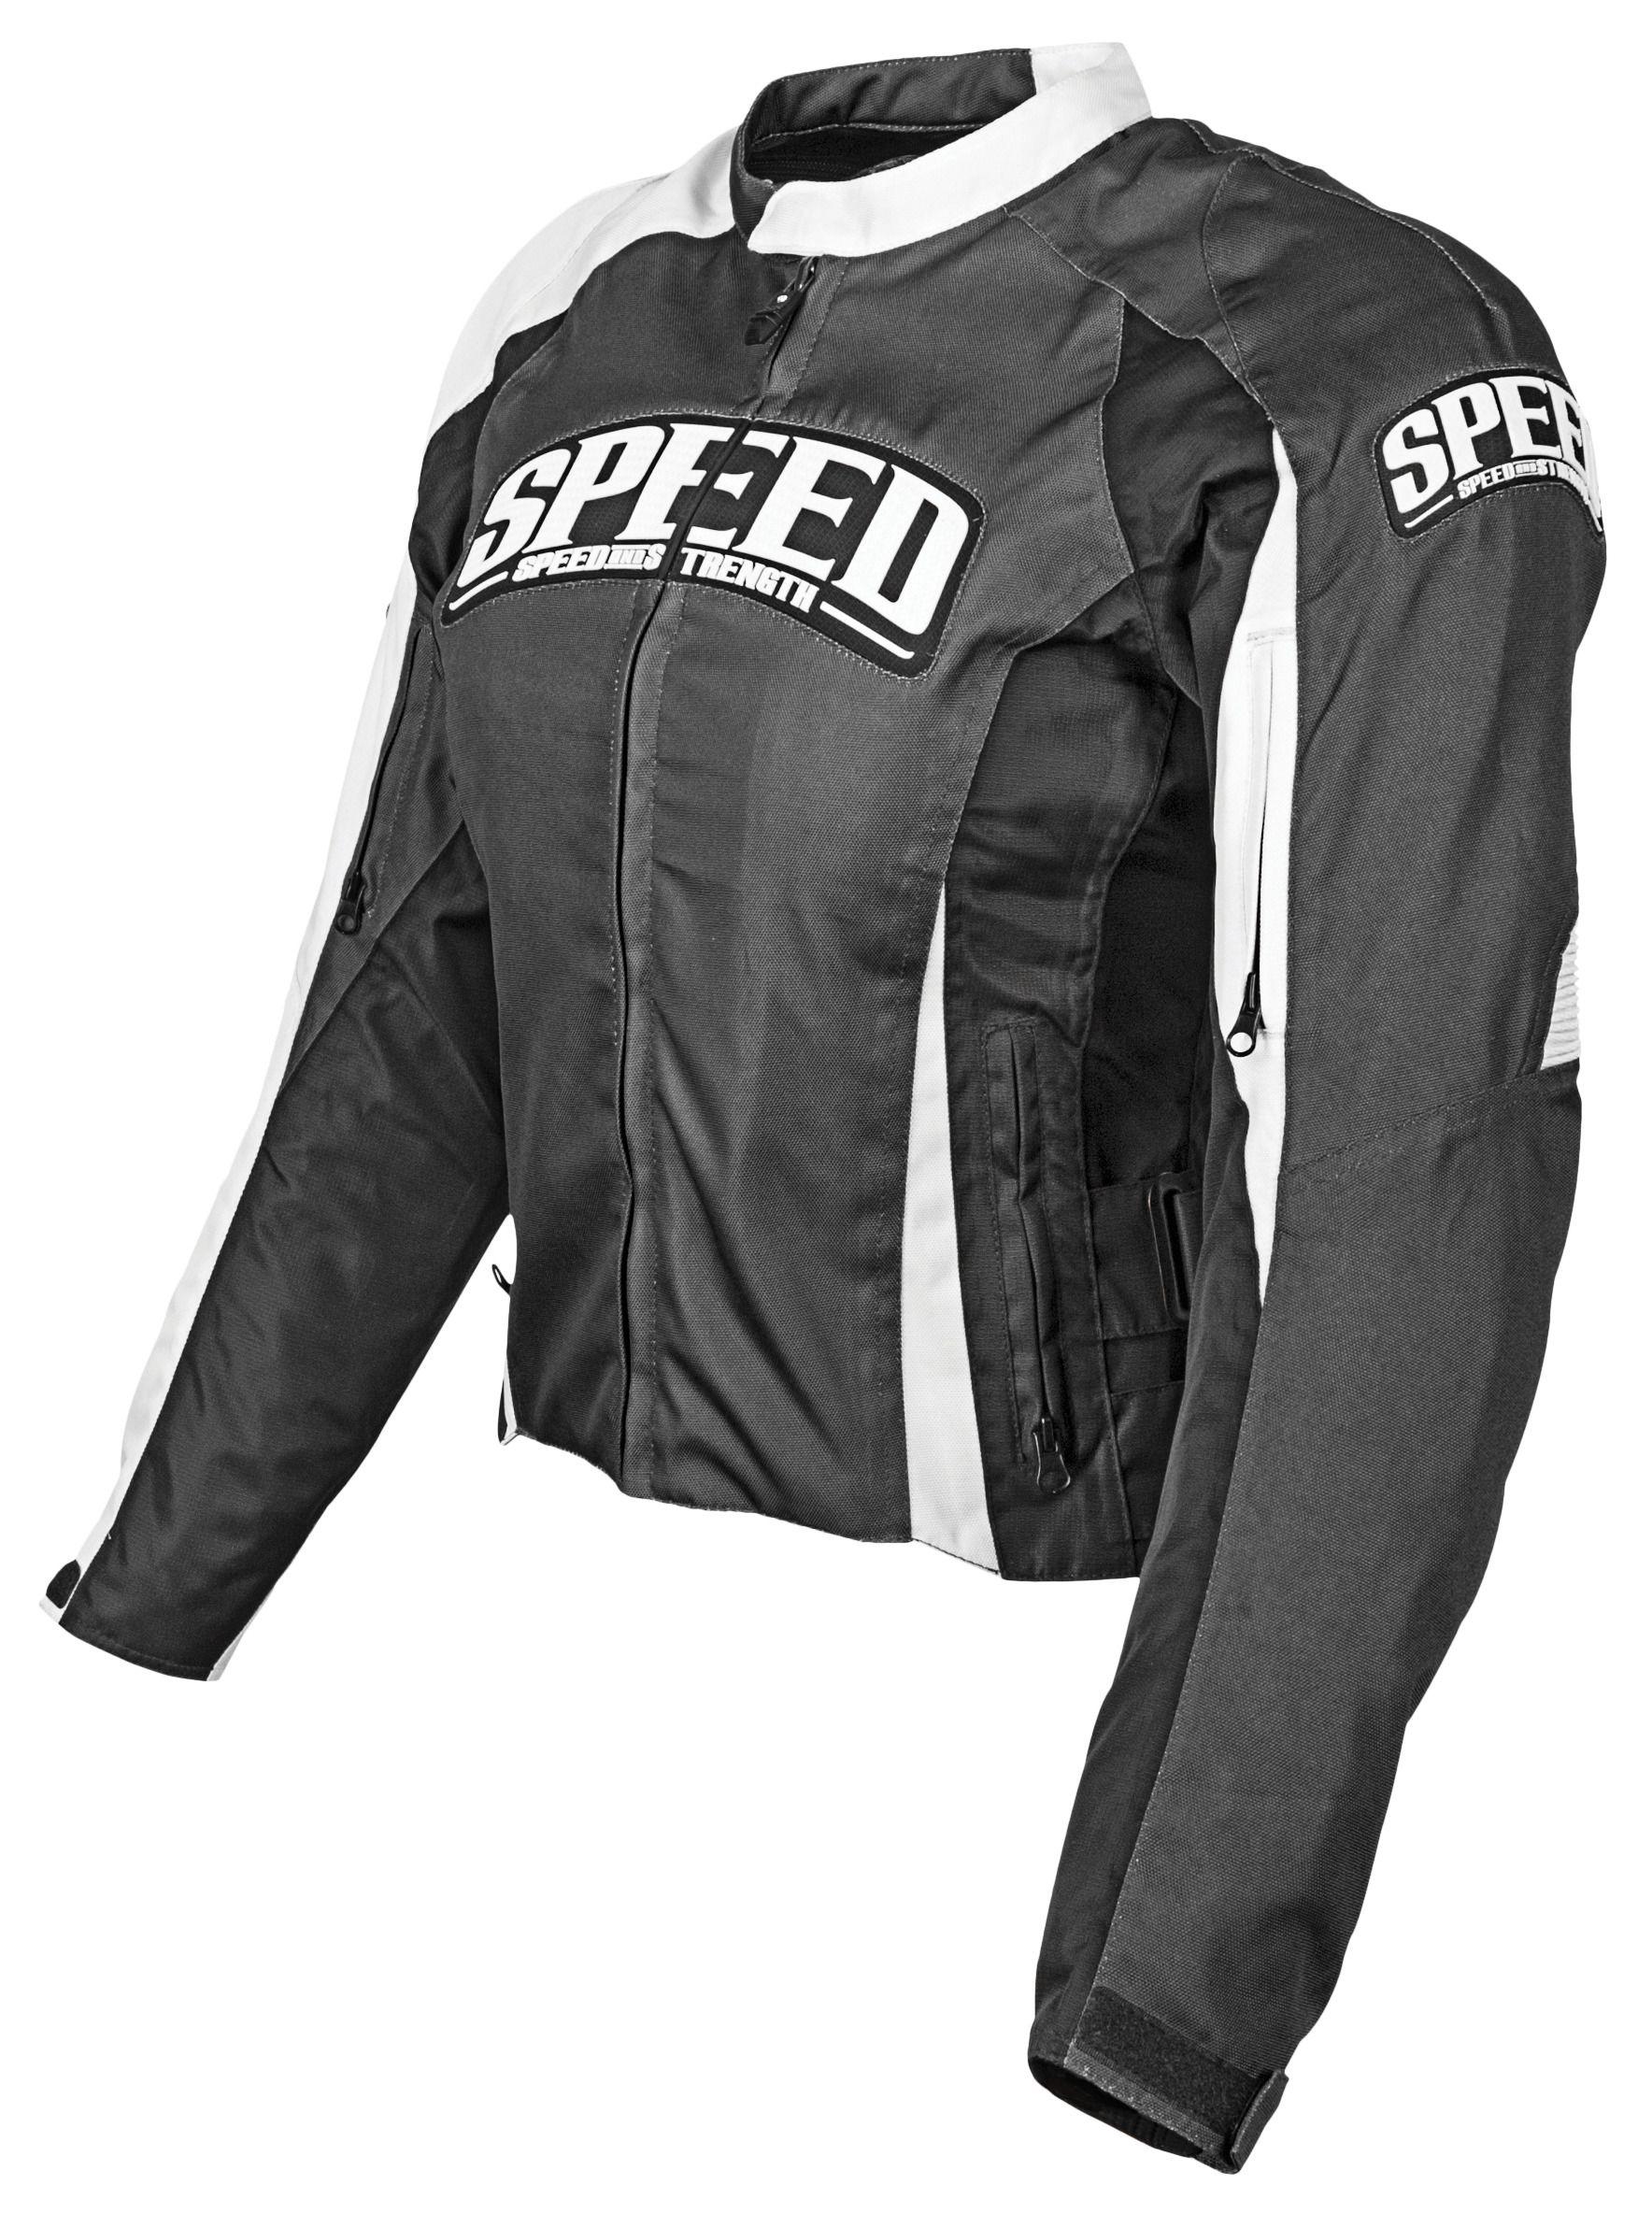 Womens Heated Jacket